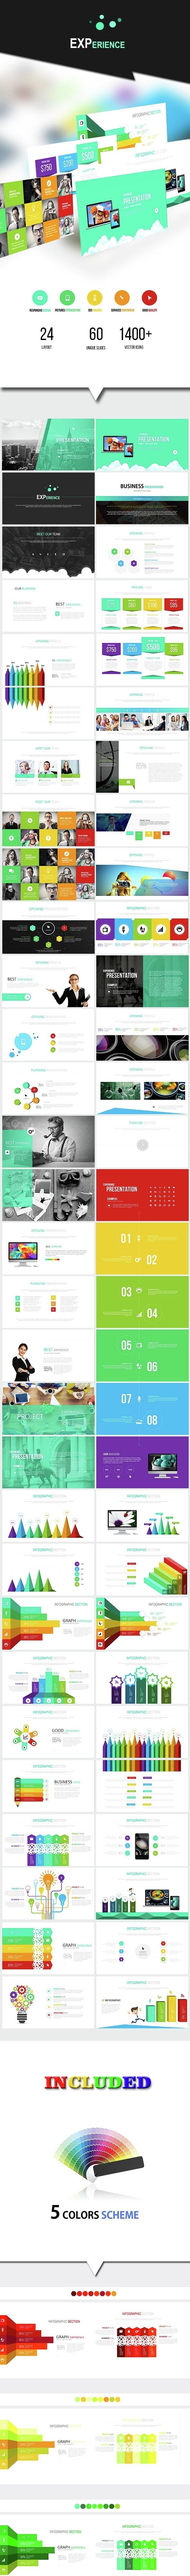 EXPERIENCE - Keynote Presentation Template - Business Keynote Templates